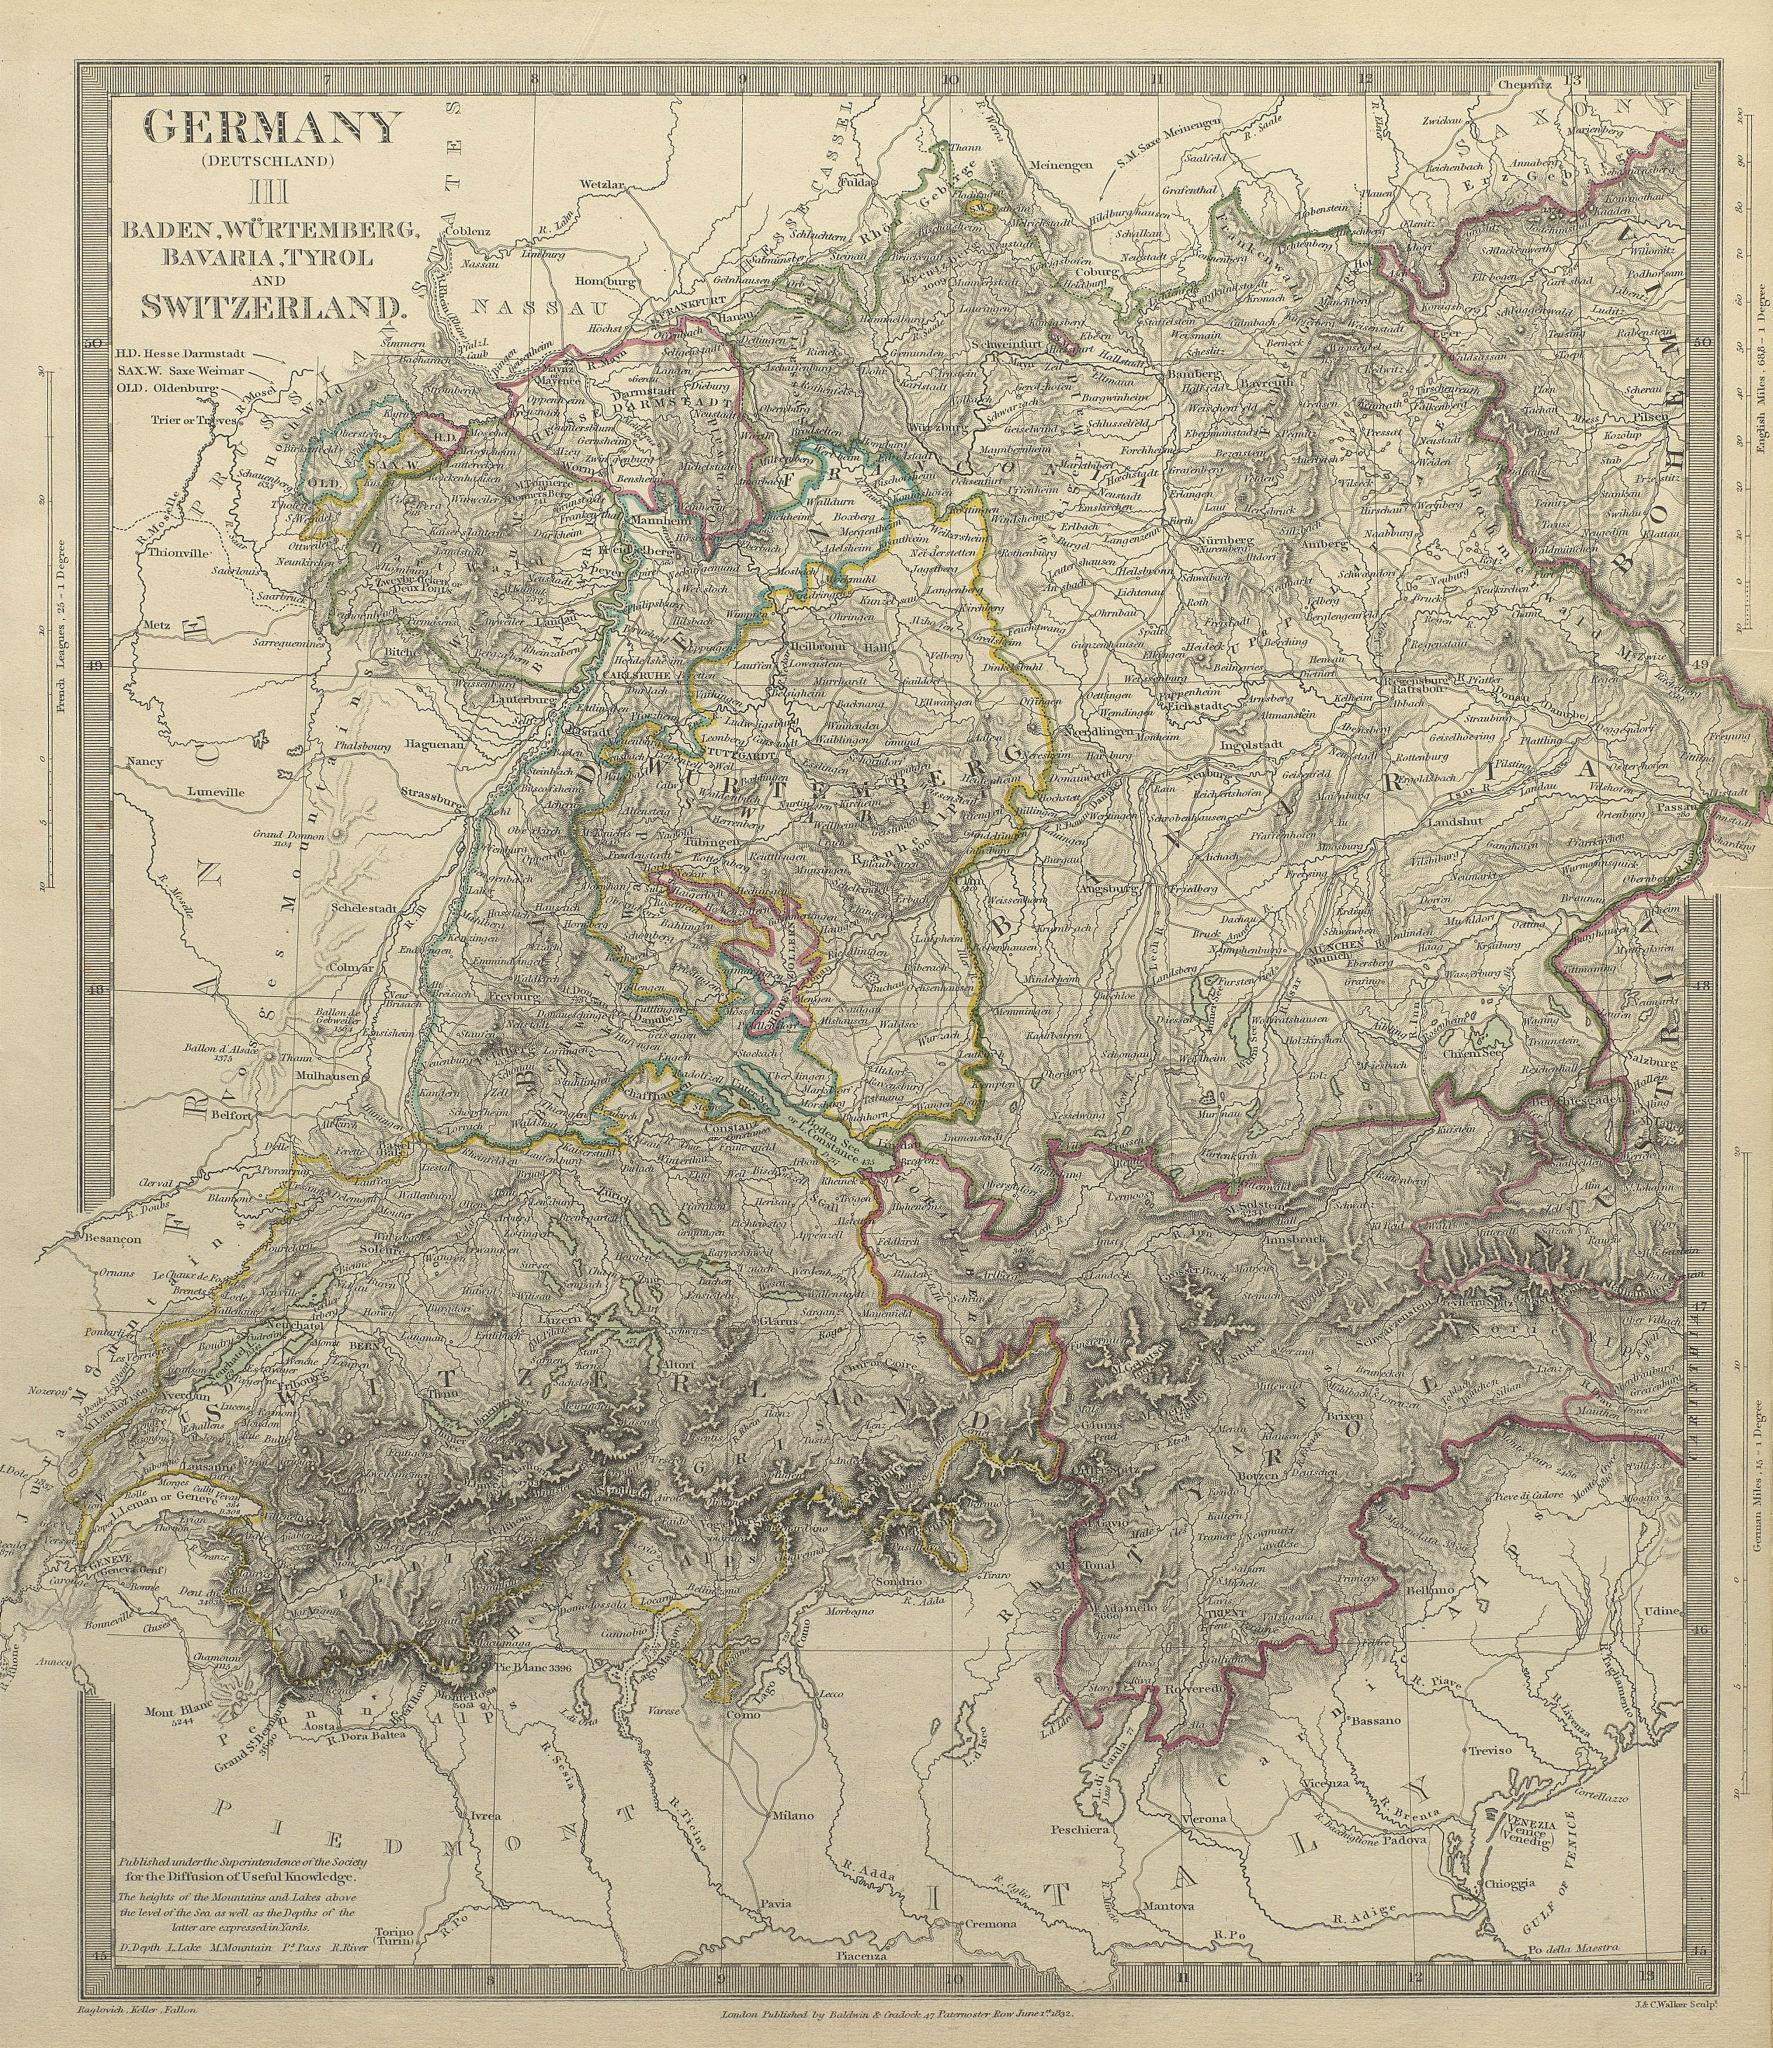 Associate Product GERMANY SWITZERLAND AUSTRIA. Baden, Württemberg, Bavaria, Tyrol. SDUK 1844 map